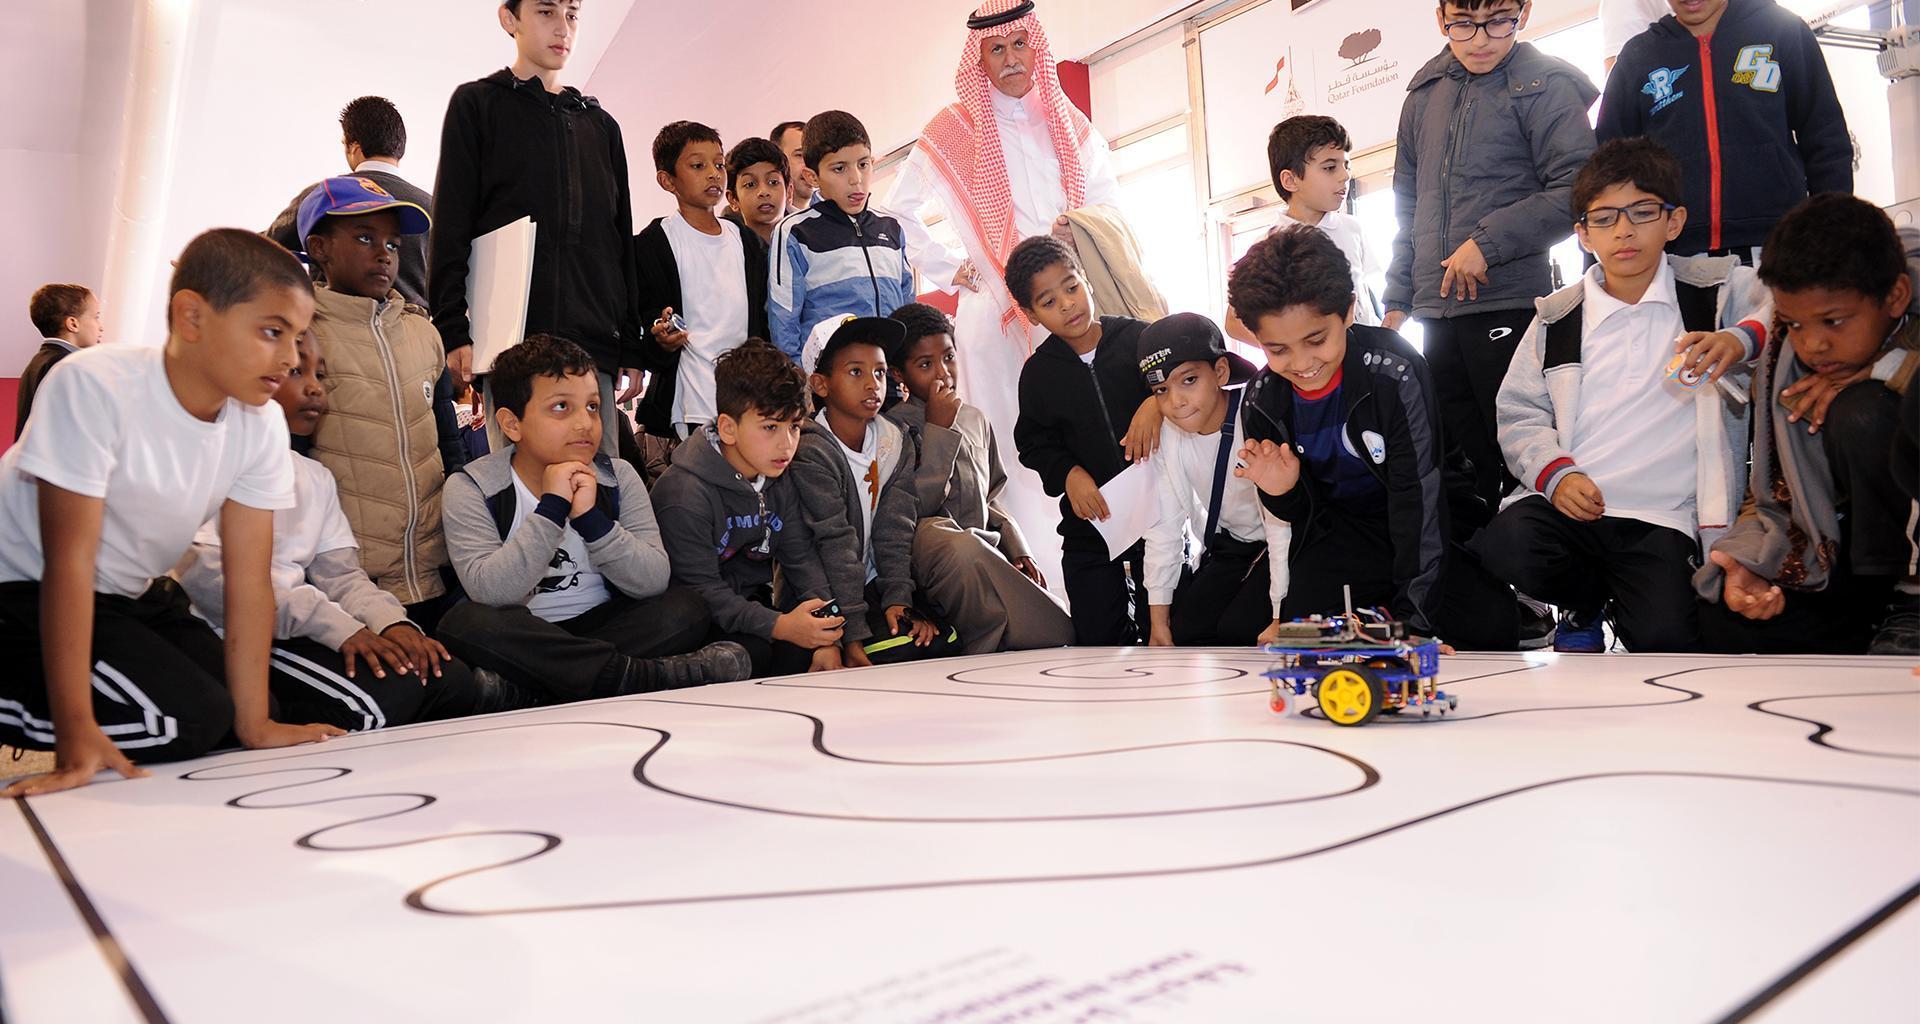 HBKU Participation in Darb Al Saai